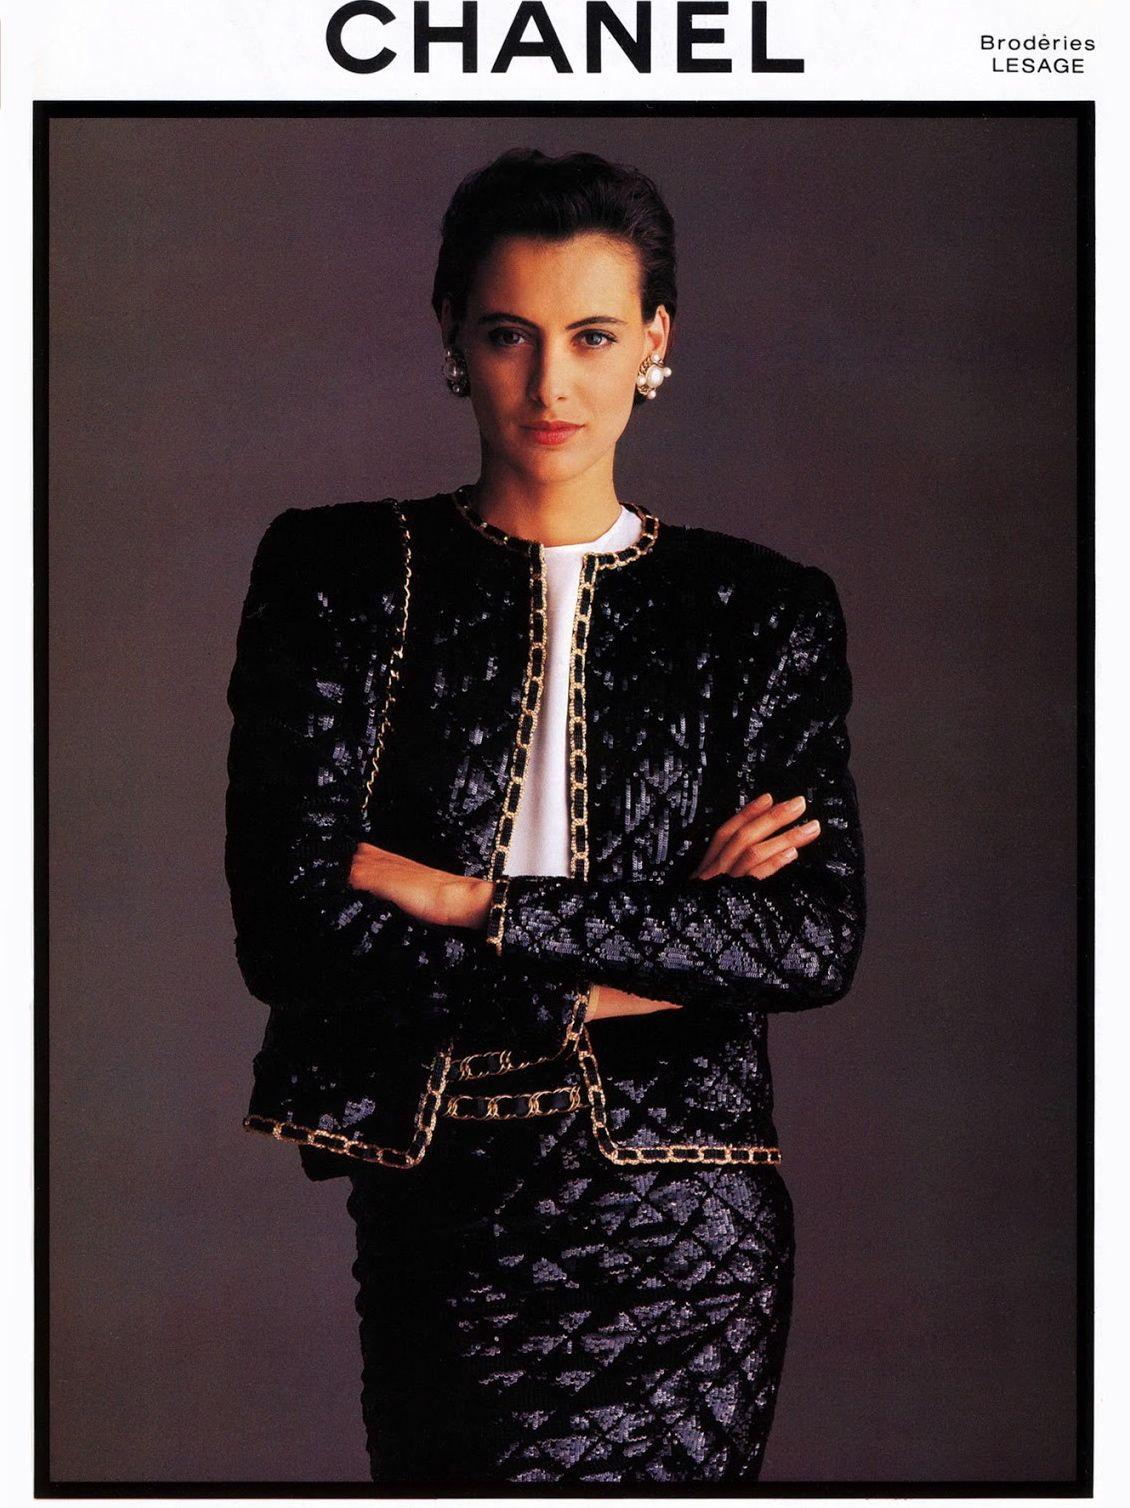 Chanel 1980s Vintage Fashion Advertising | Moda chanel, Ideias fashion, Chanel vintage